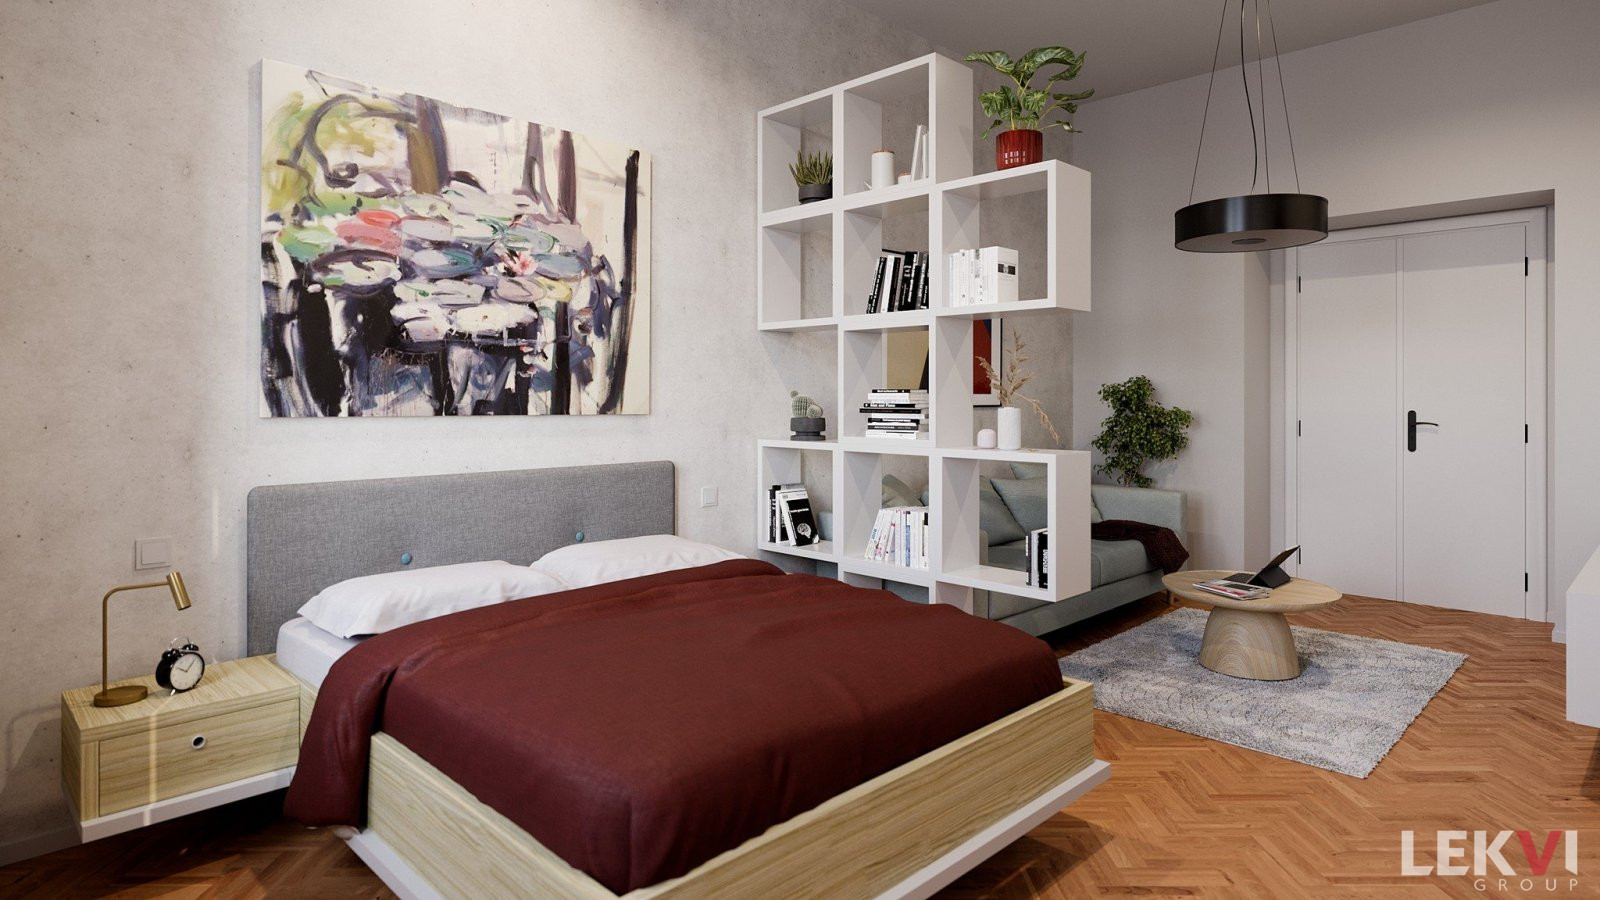 Prodej bytu 2+1, 78 m2 - Sokolovská, Praha 8